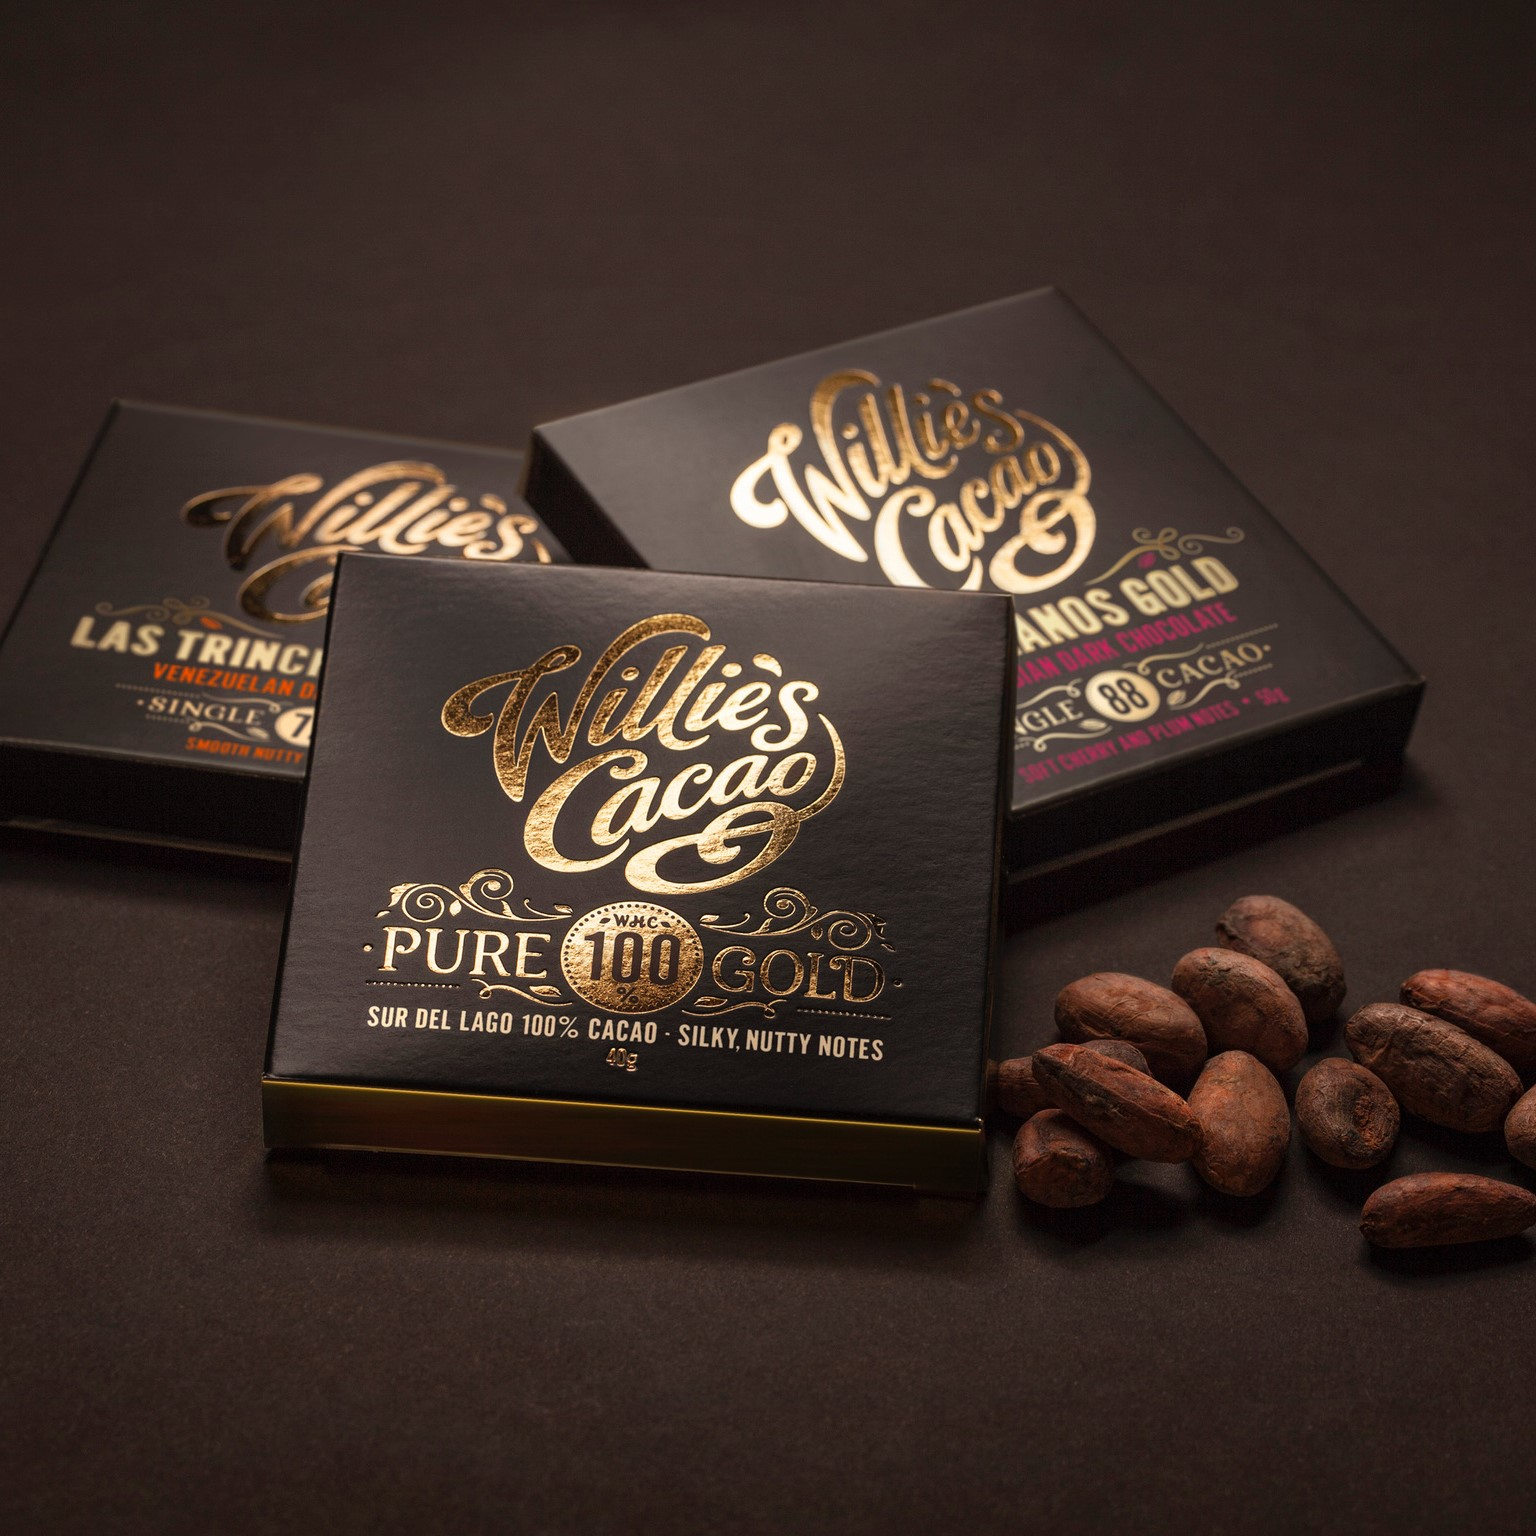 Single Estate chocolate bars   Willies Cacao